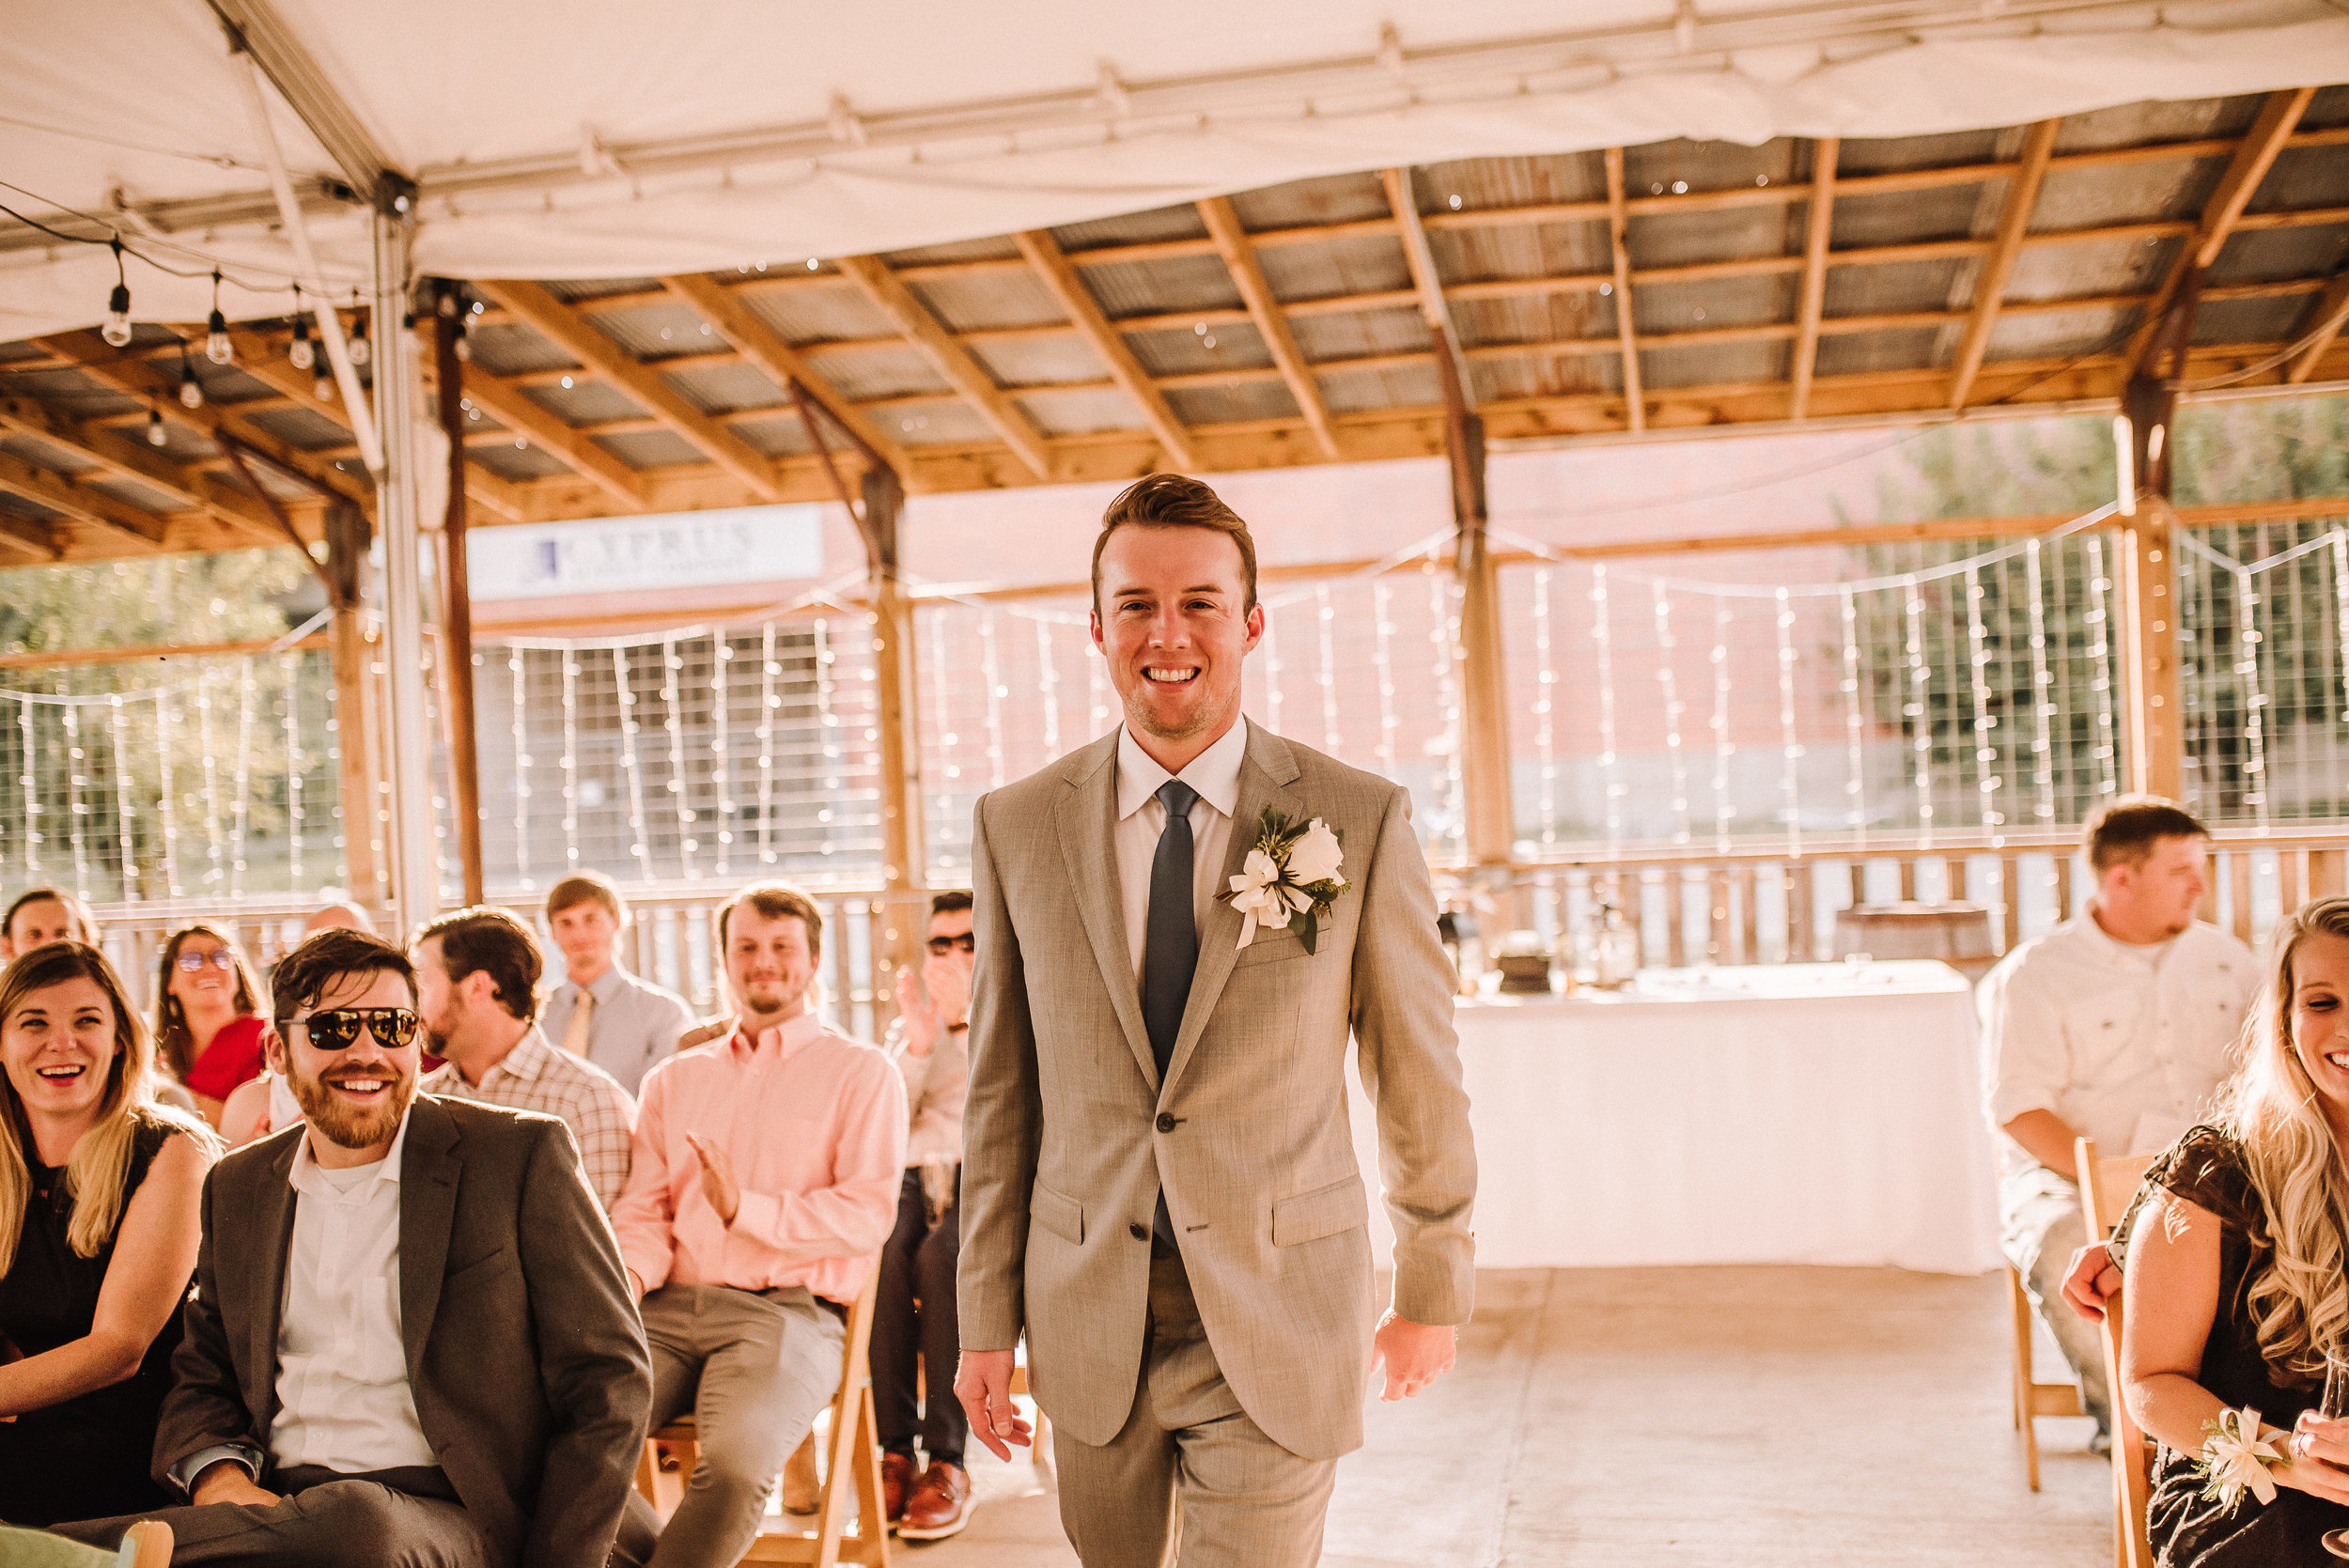 Pearson-Wiseacre-Wedding_Ashley-Benham-Photography (177 of 633).jpg